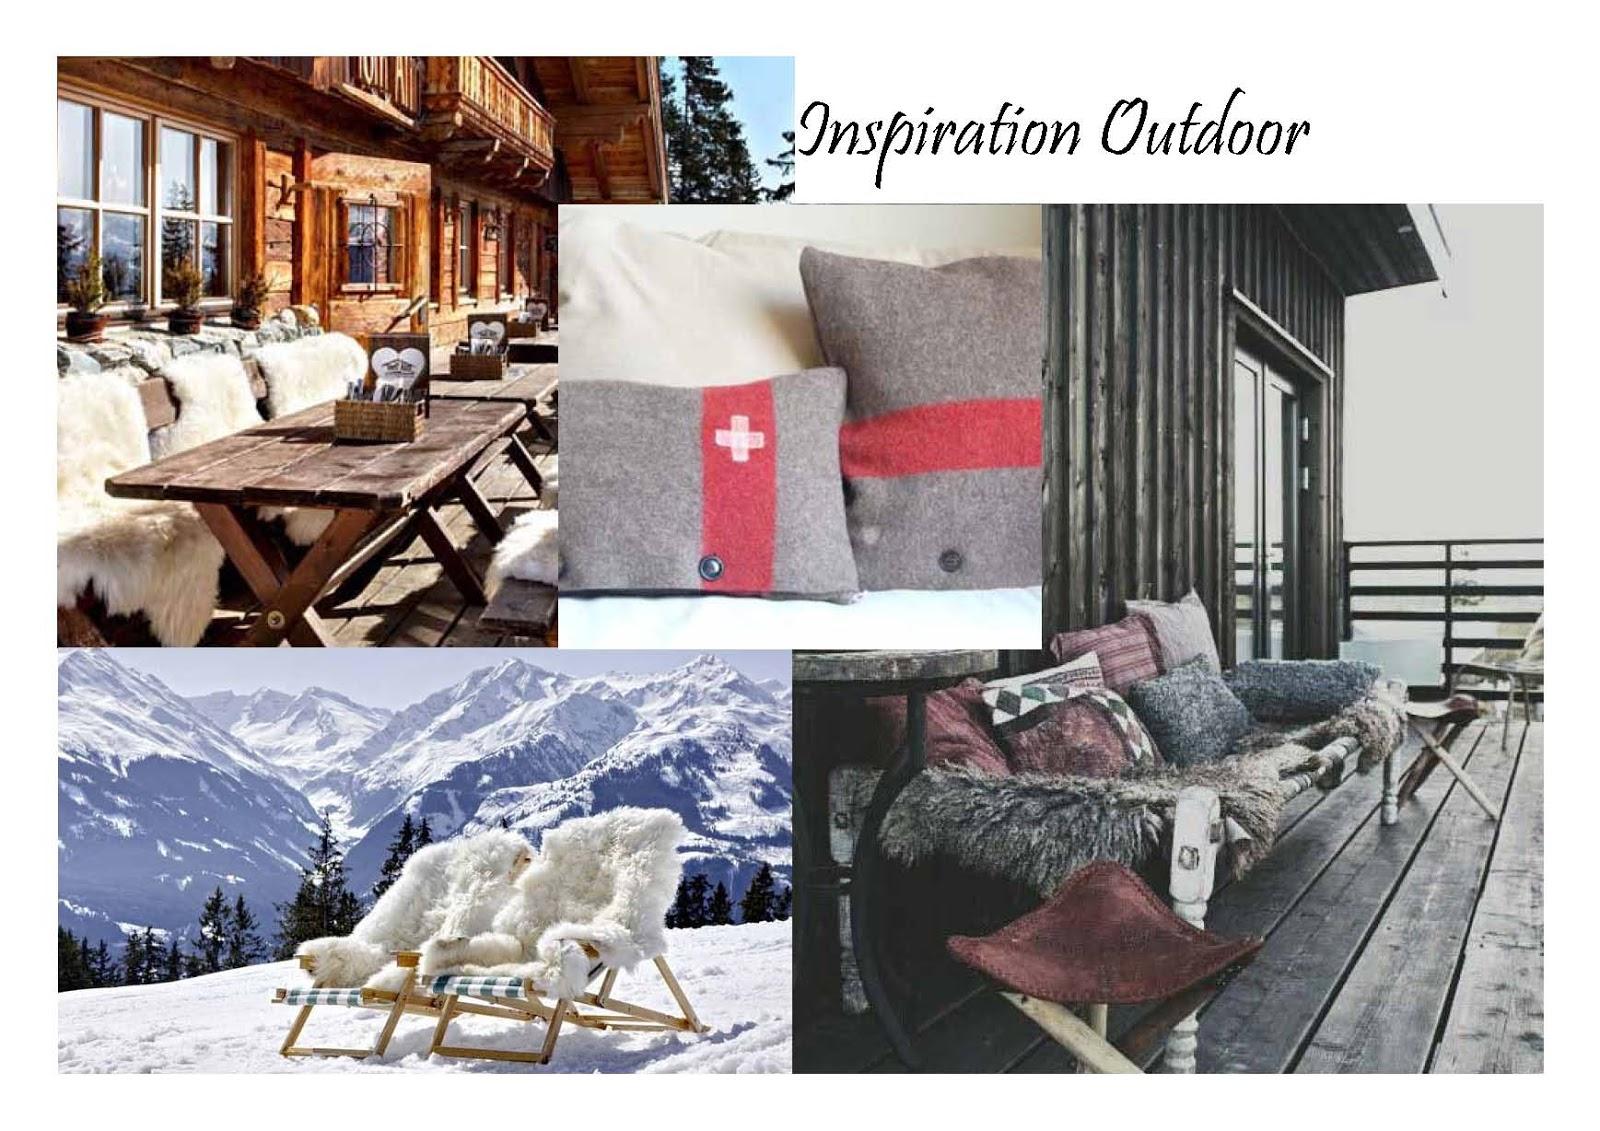 Inspiration Outdoor